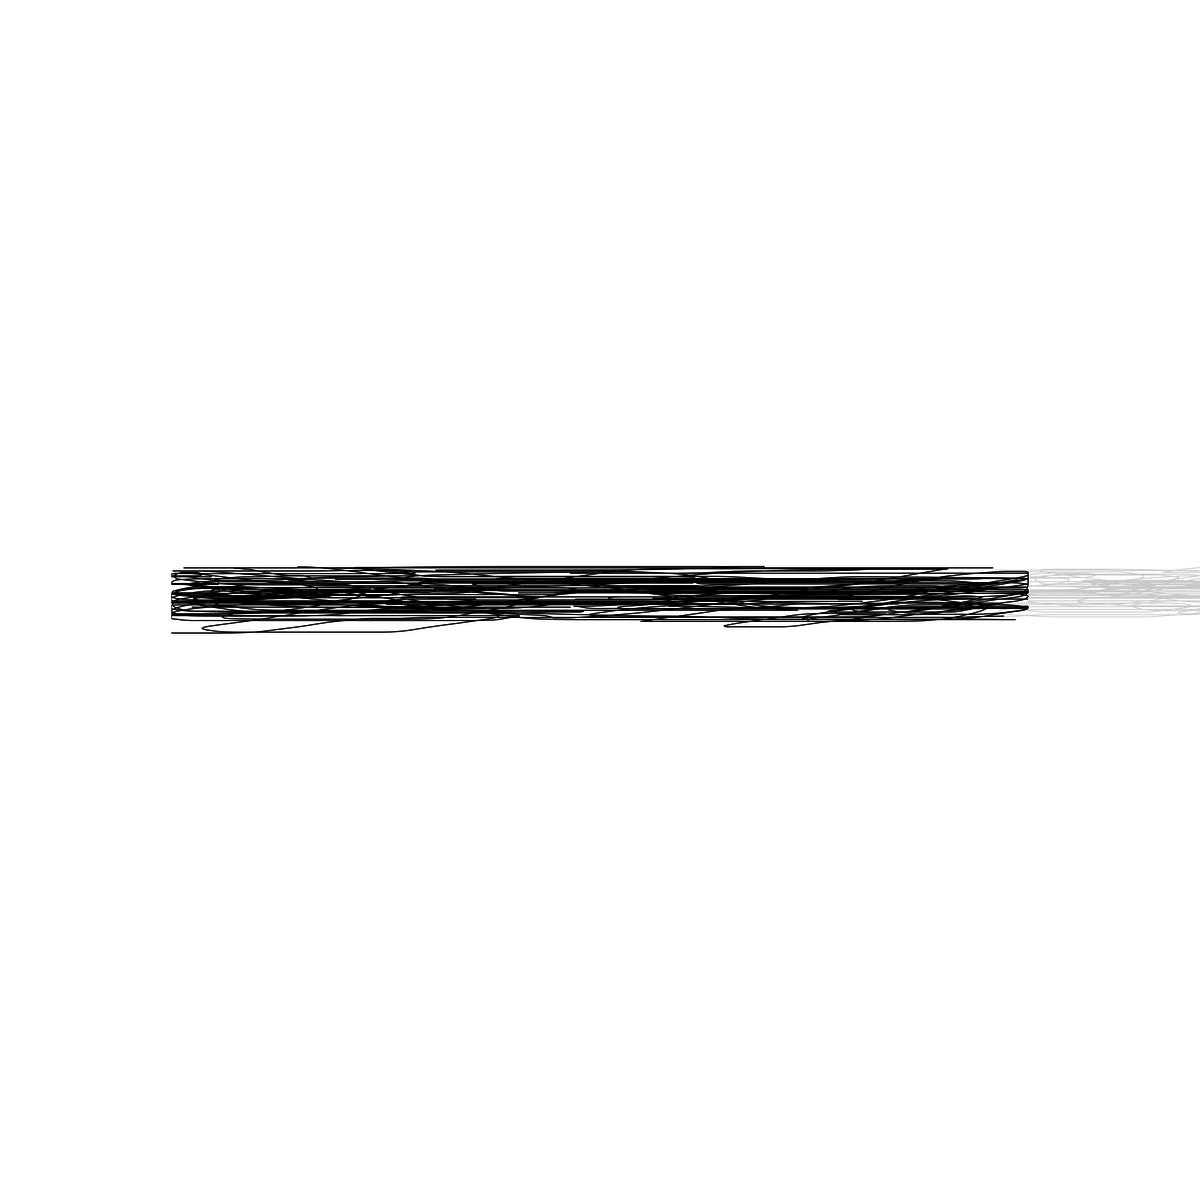 BAAAM drawing#11389 lat:52.4759712219238300lng: 13.4060249328613280